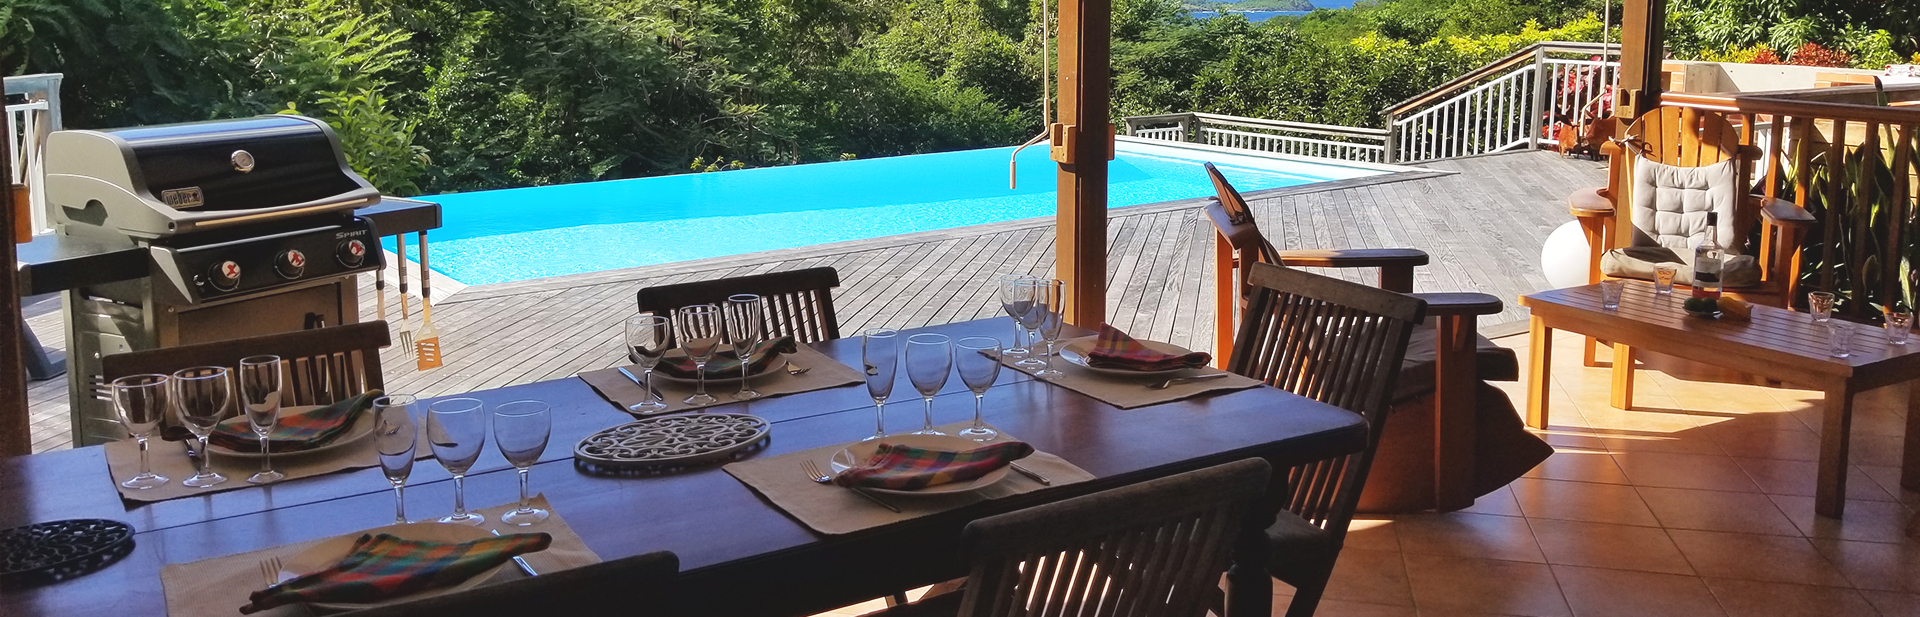 table-dhotes-guadeloupe-gites-bungalow-restaurant-manger